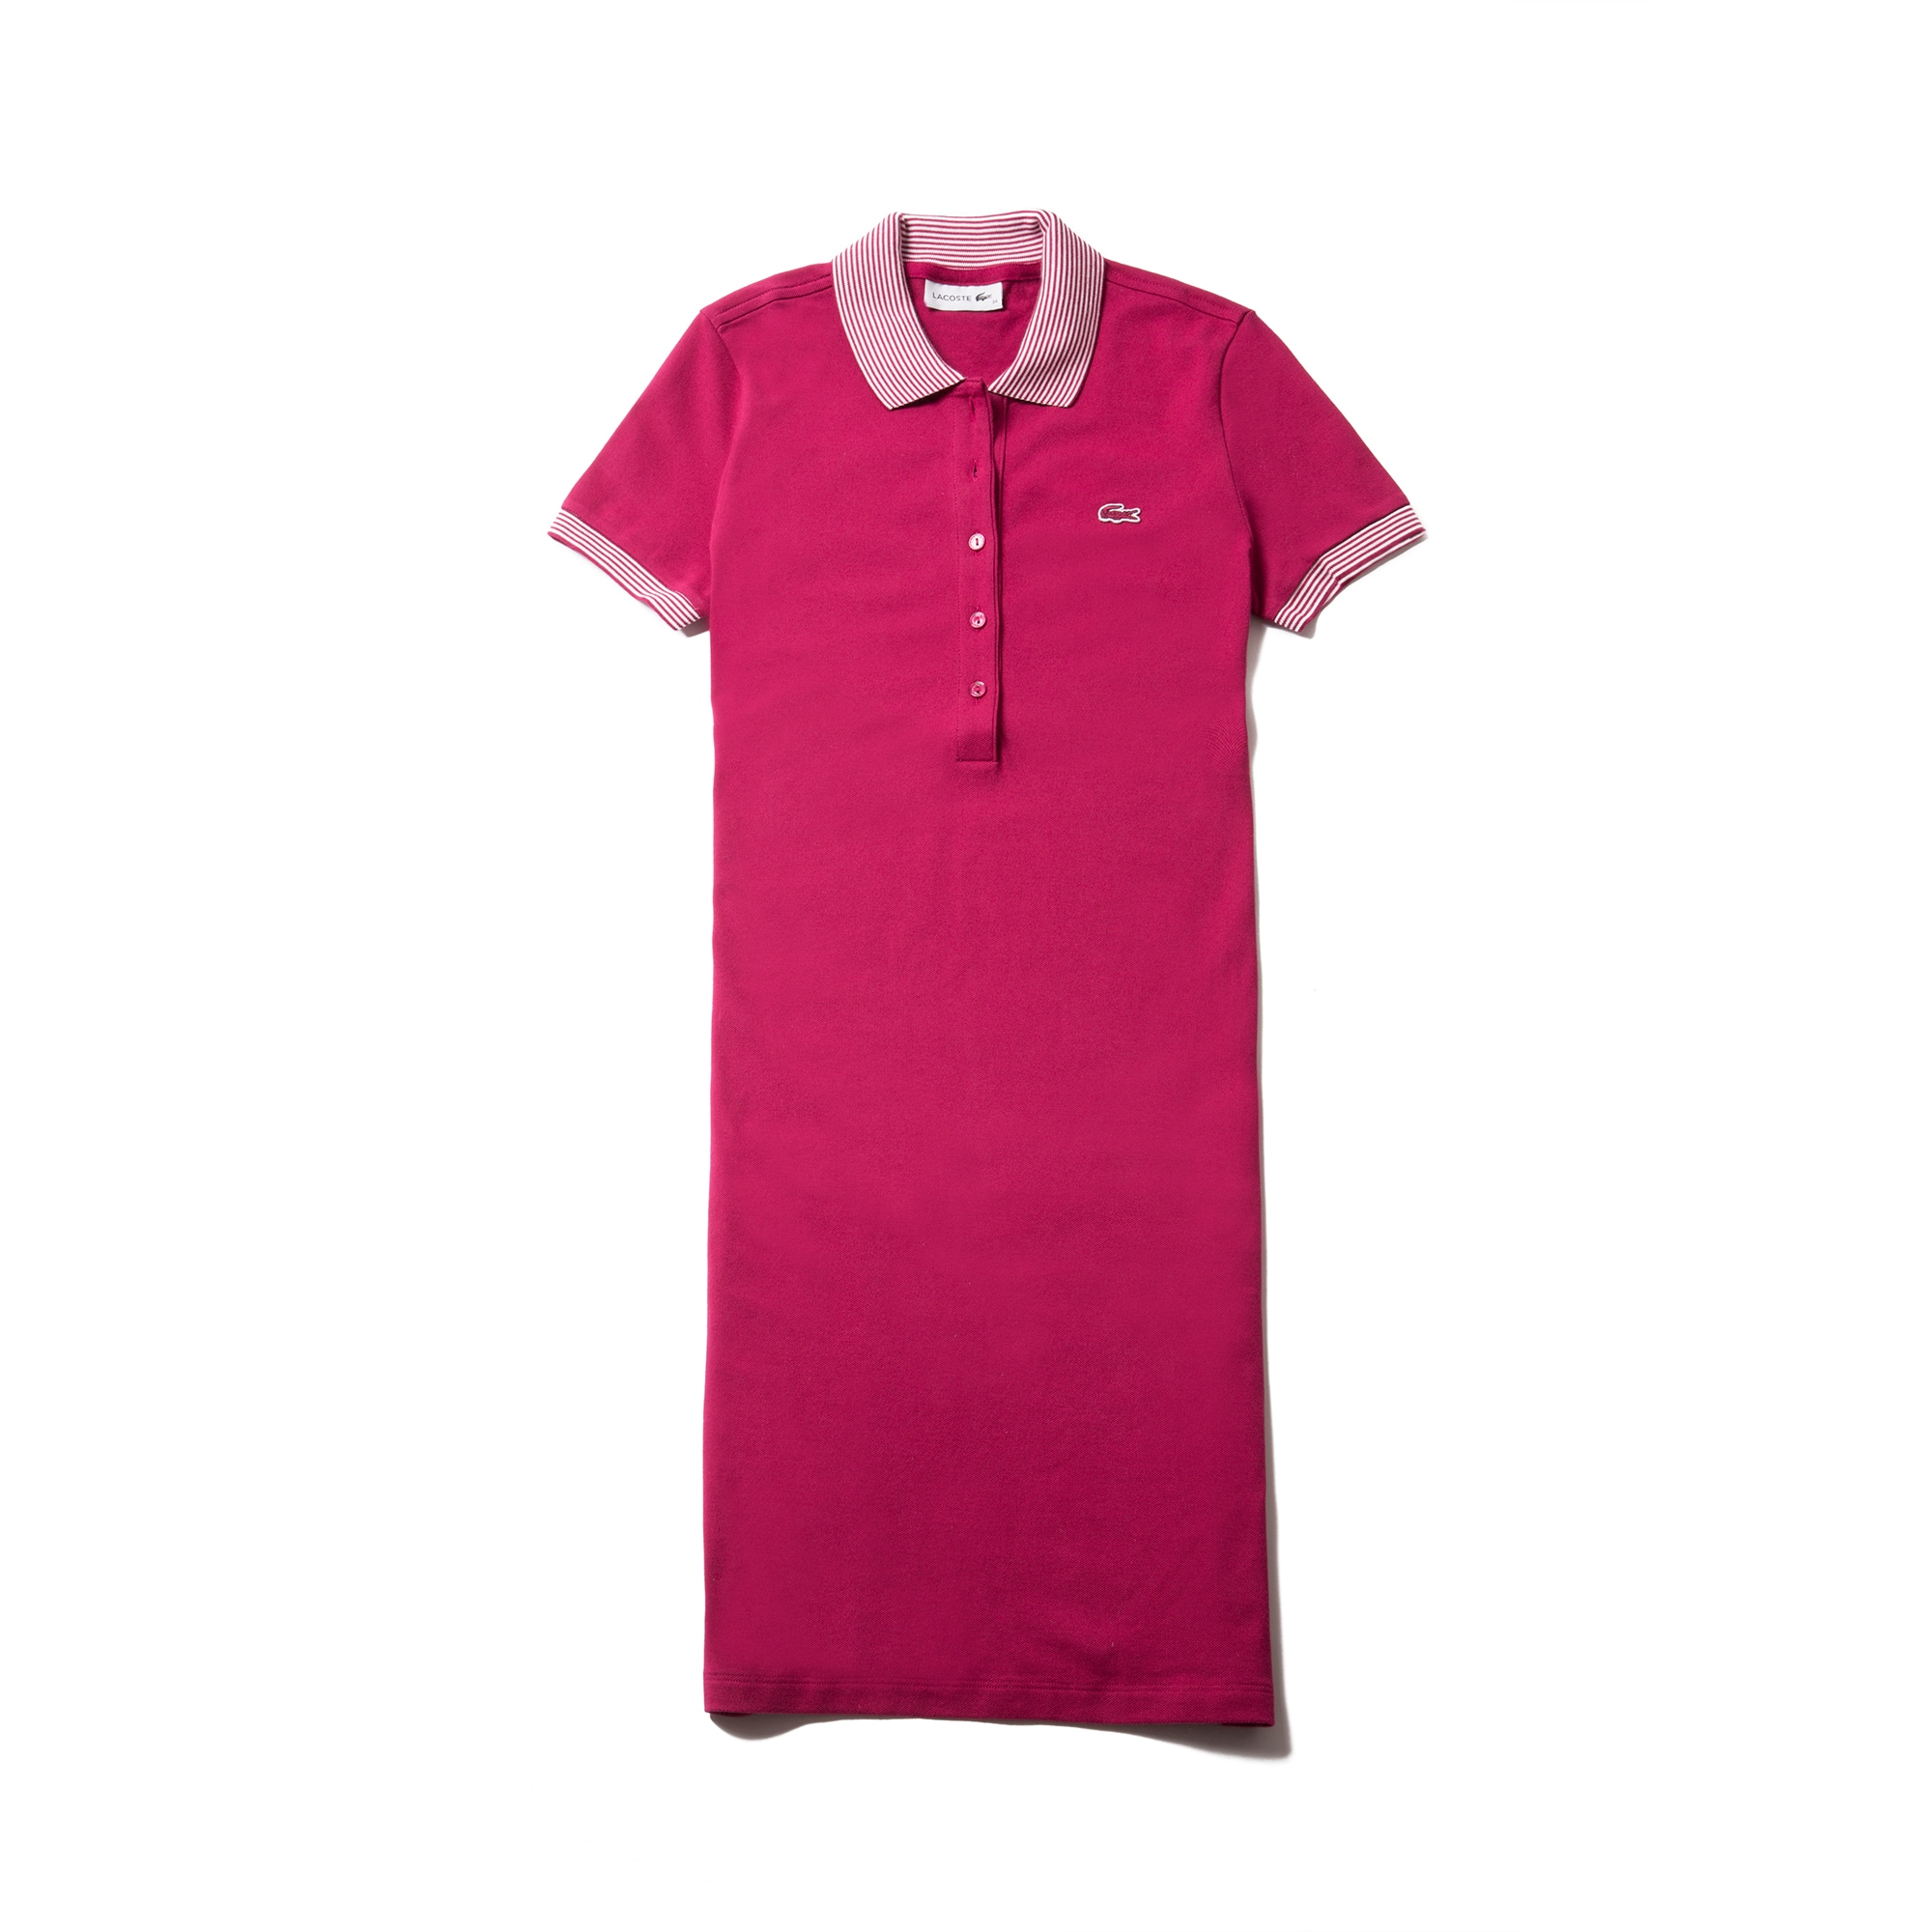 Women's Stretch Mini Cotton Piqué And Contrast Accents Polo Dress